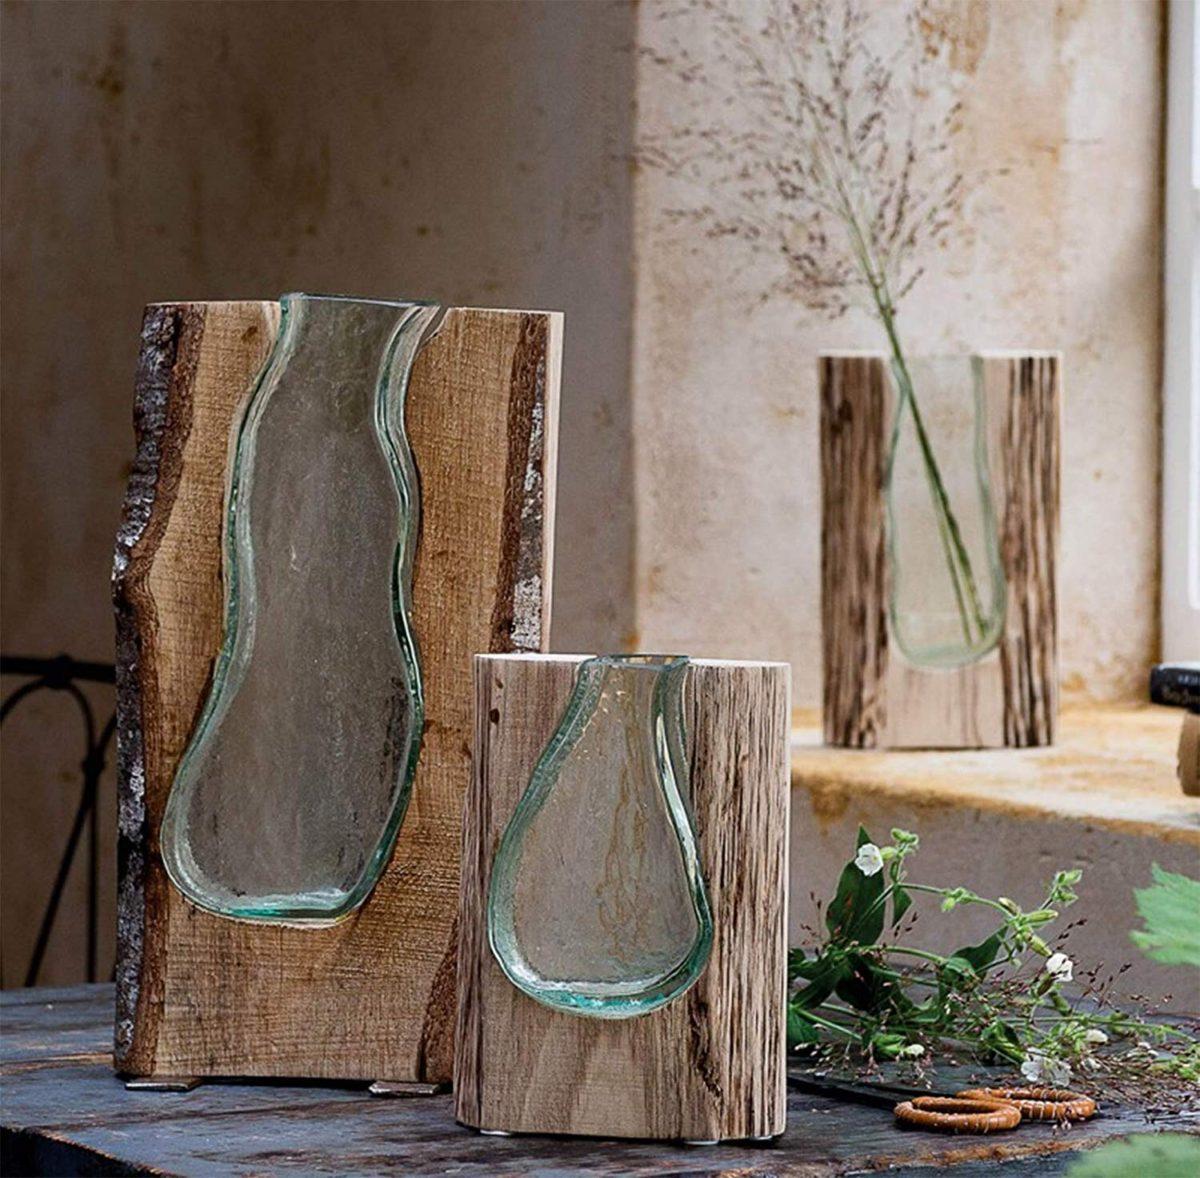 81IdxWMk XL. AC SL1500  1200x1178 - Vază din lemn Casolare 36 см (L038510)